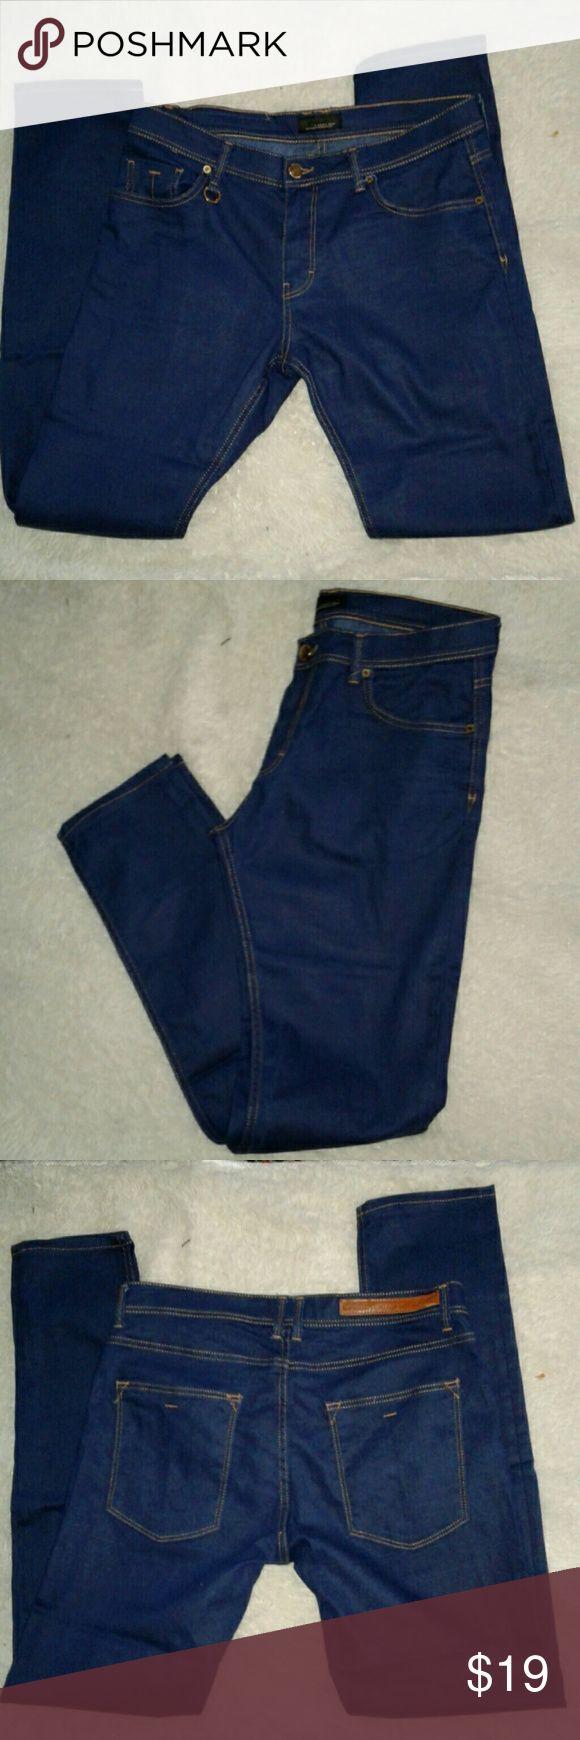 BLACK TAG BY ZARA MAN BOOTCUT JEANS AND ZARA MAN DENIM WARE, GOLD CONTRAST STITCHING, 5 POCKETS, SIGNATURE HARDWARE, TRUE TO SIZE ZARA MAN Jeans Bootcut